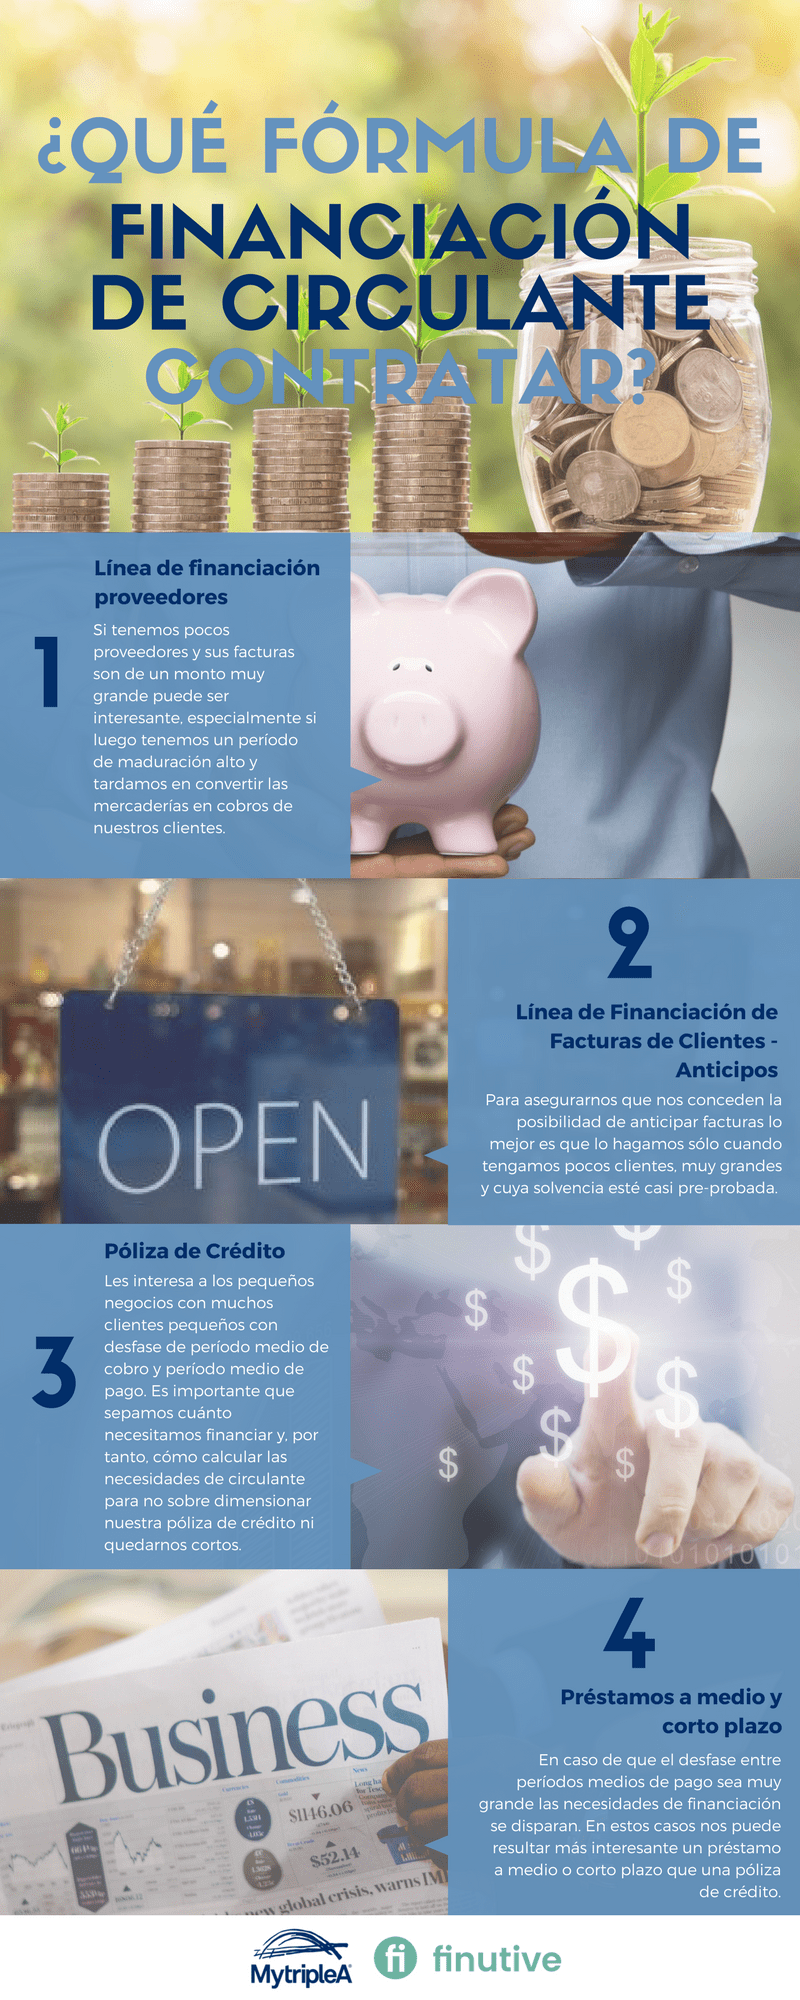 Infografía formas de financiación de circulante